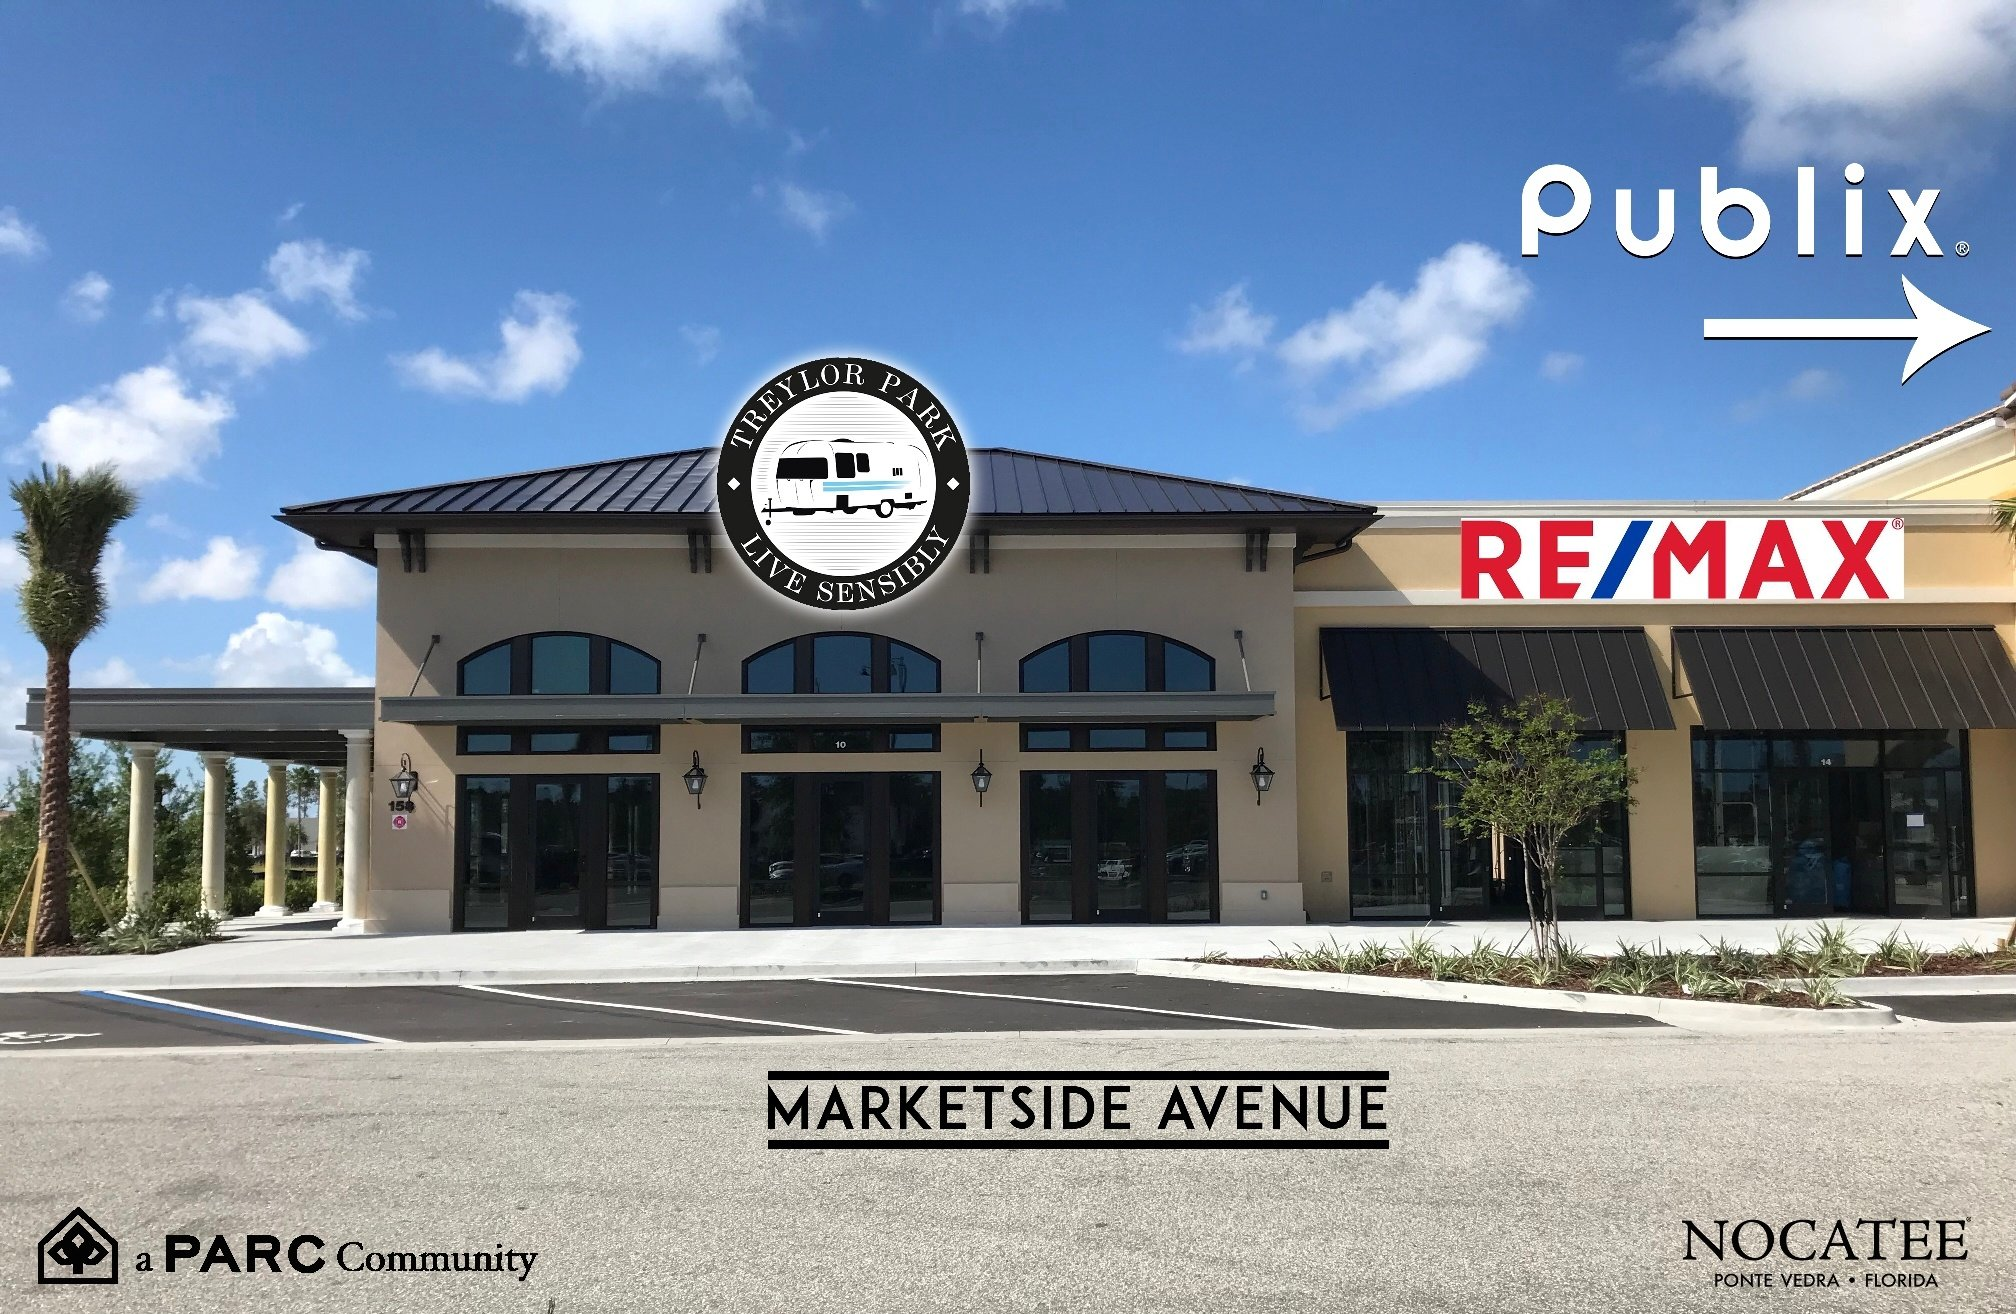 Treylor Park Restaurant Opening Soon at Nocatee Town Center